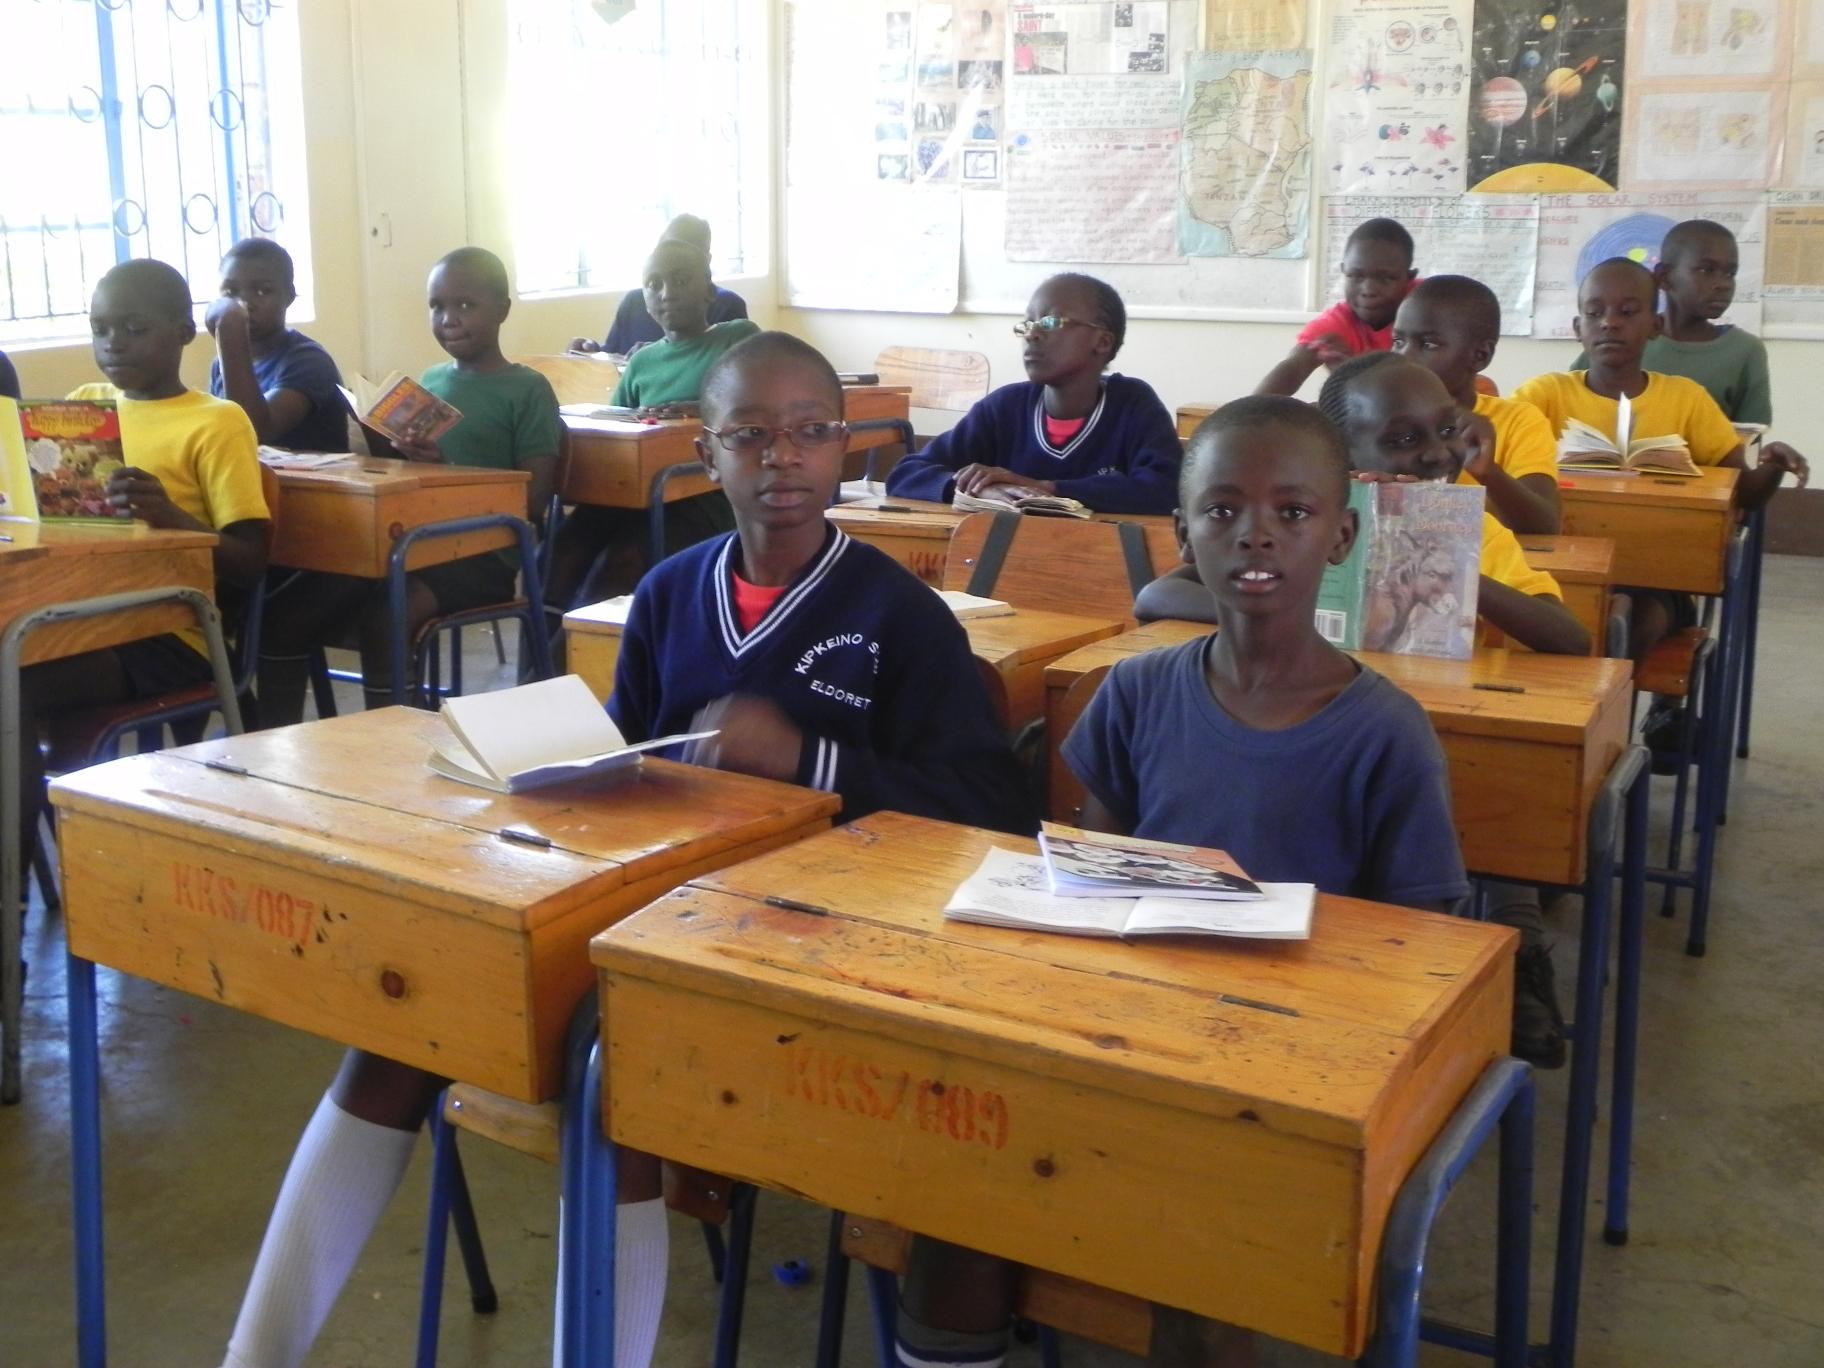 Kipkeino Primary School – Kenya: Simply the BEST